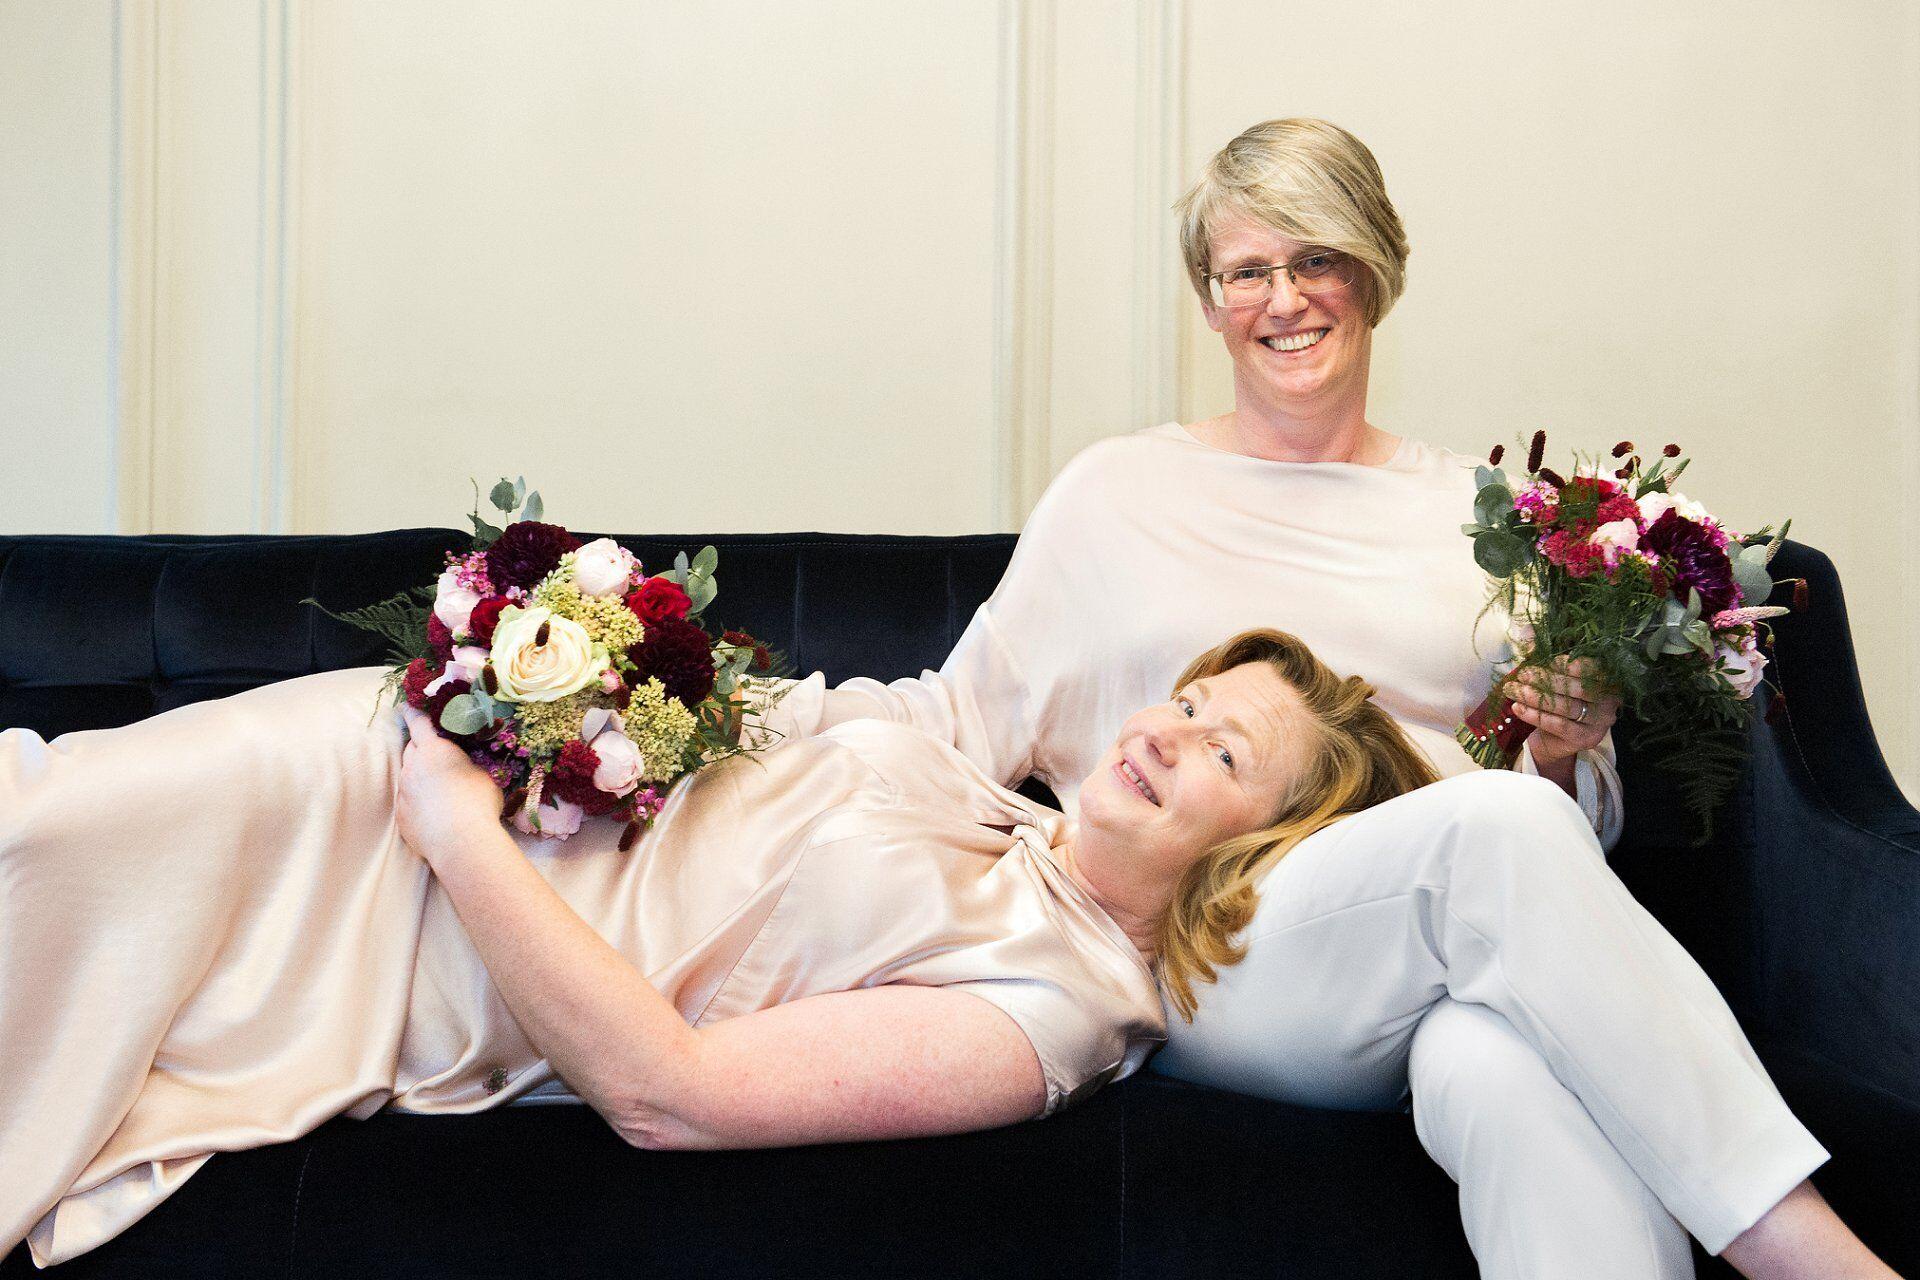 two brides relaxing on the navy velvet sofa in the soho room at marylebone register office